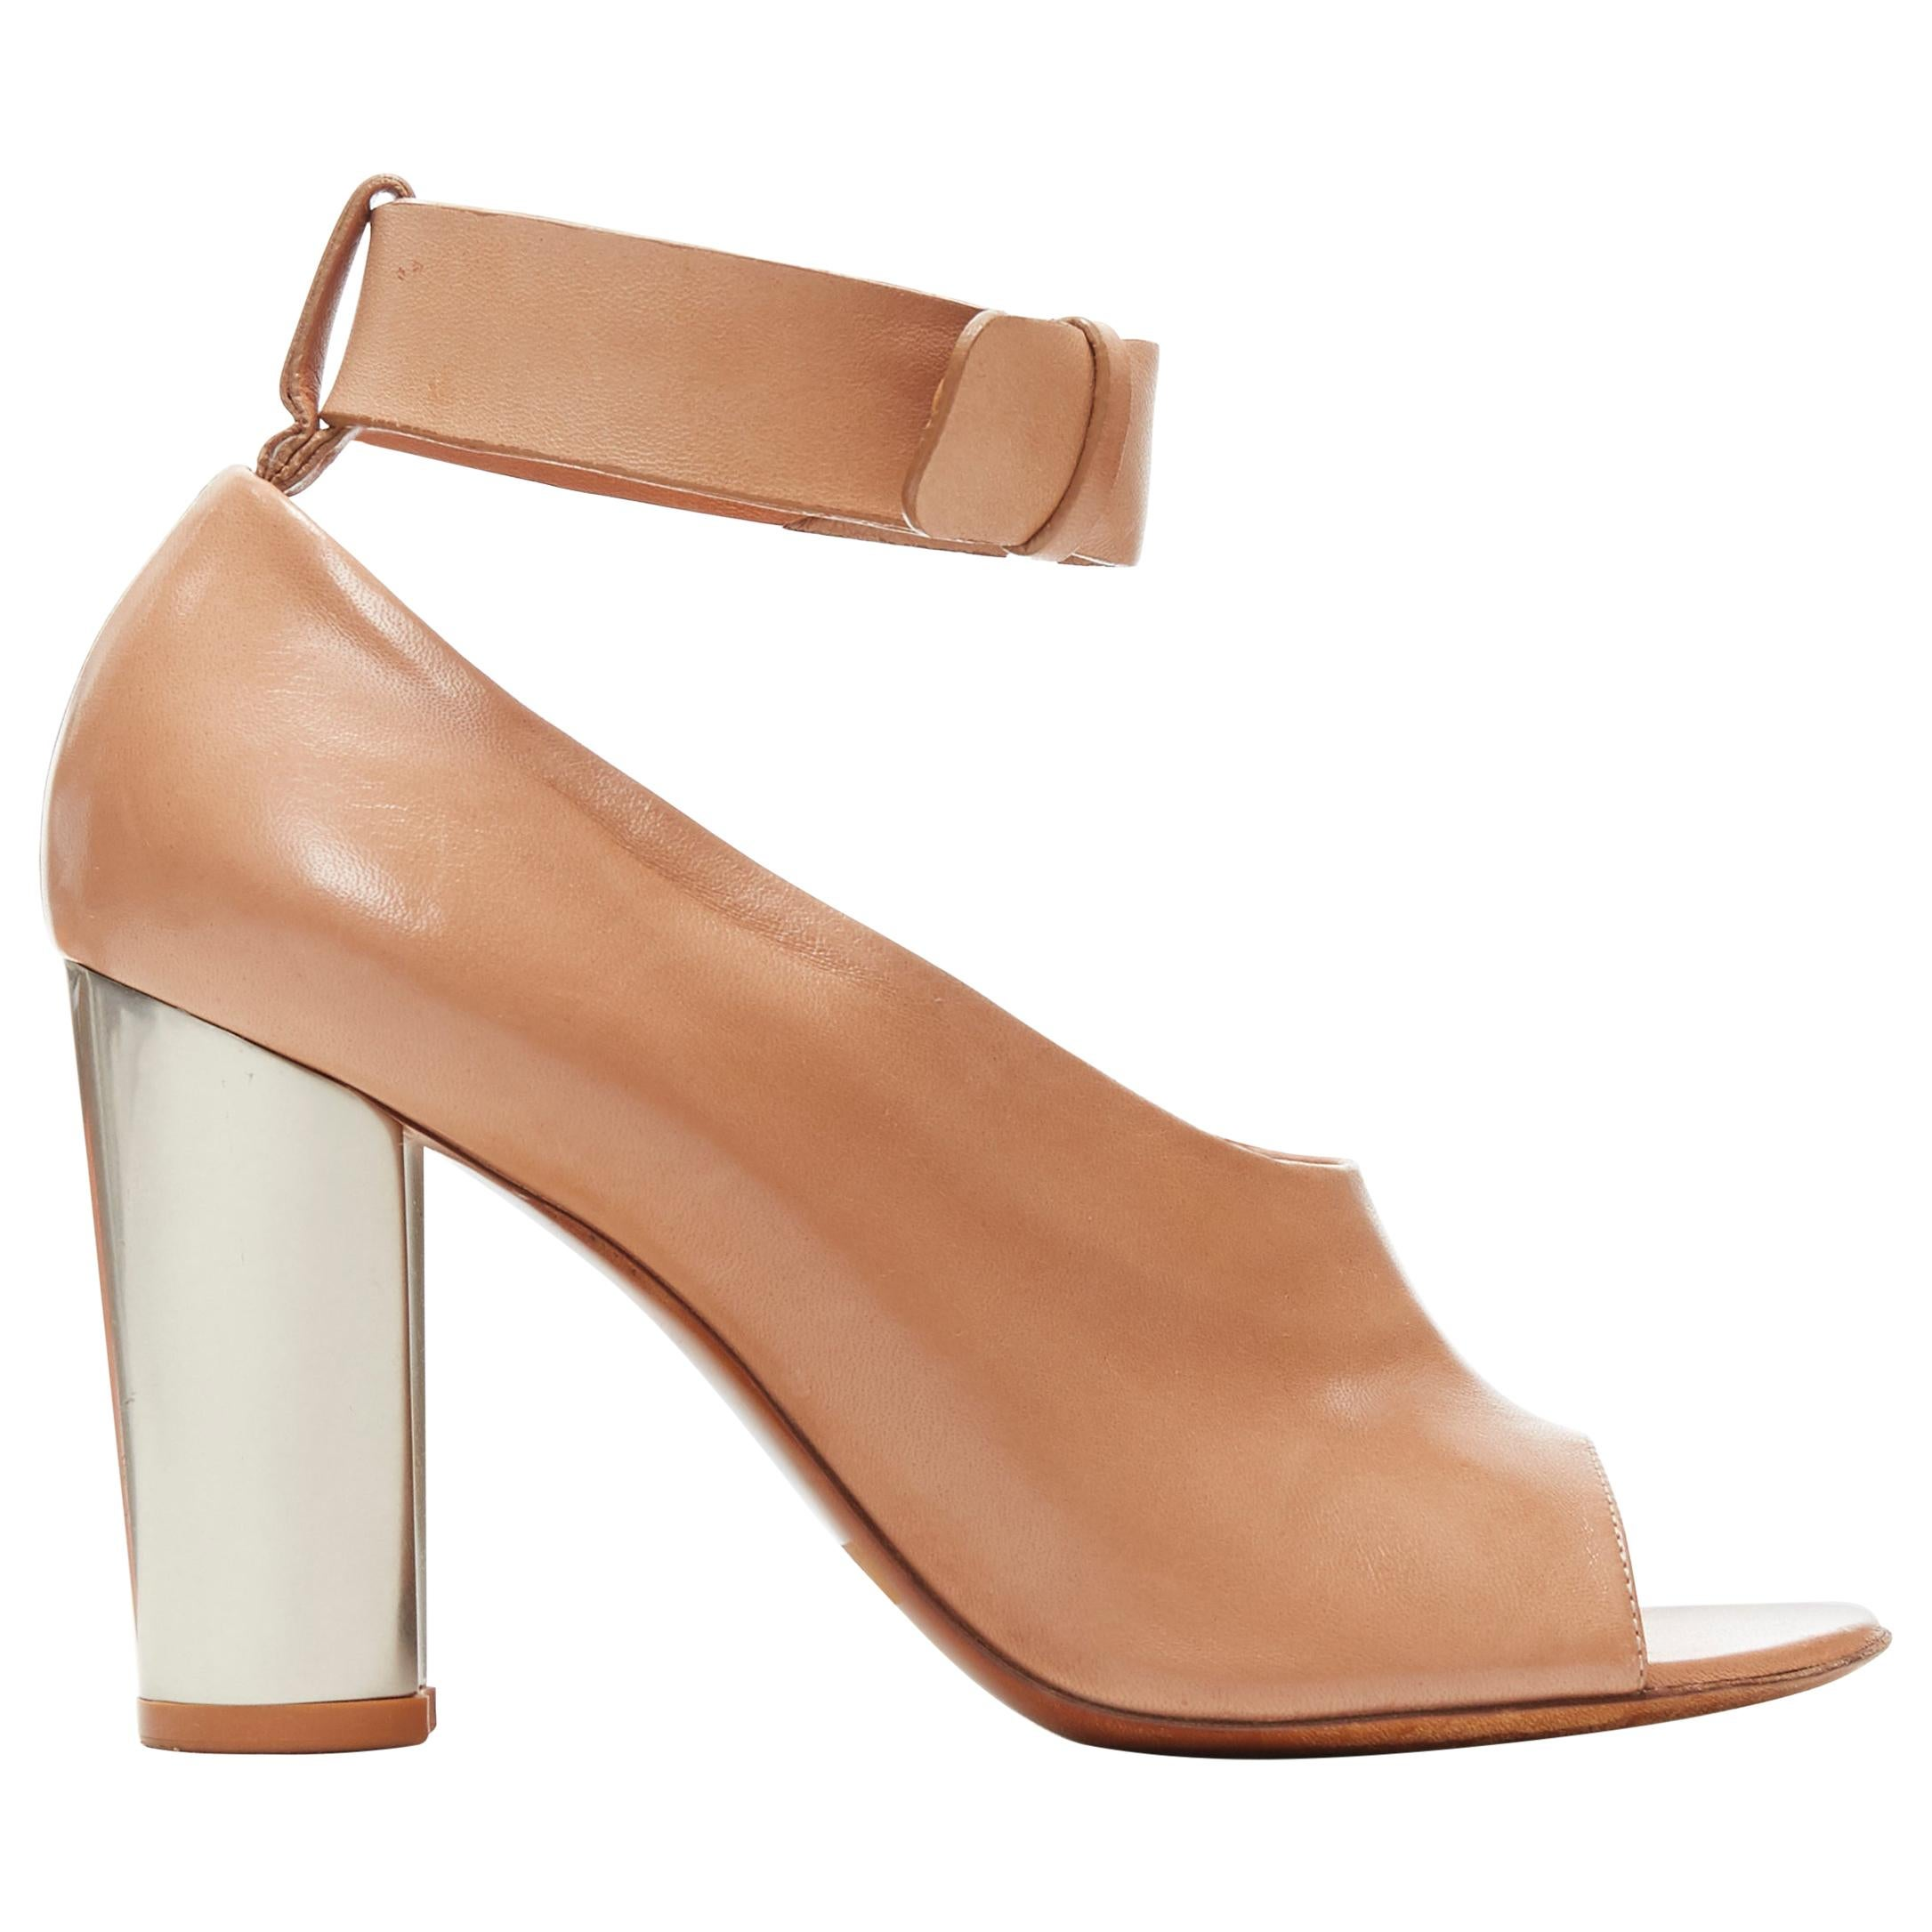 CELINE PHOEBE PHILO tan brown leather open toe silver metal glove heel EU37.5